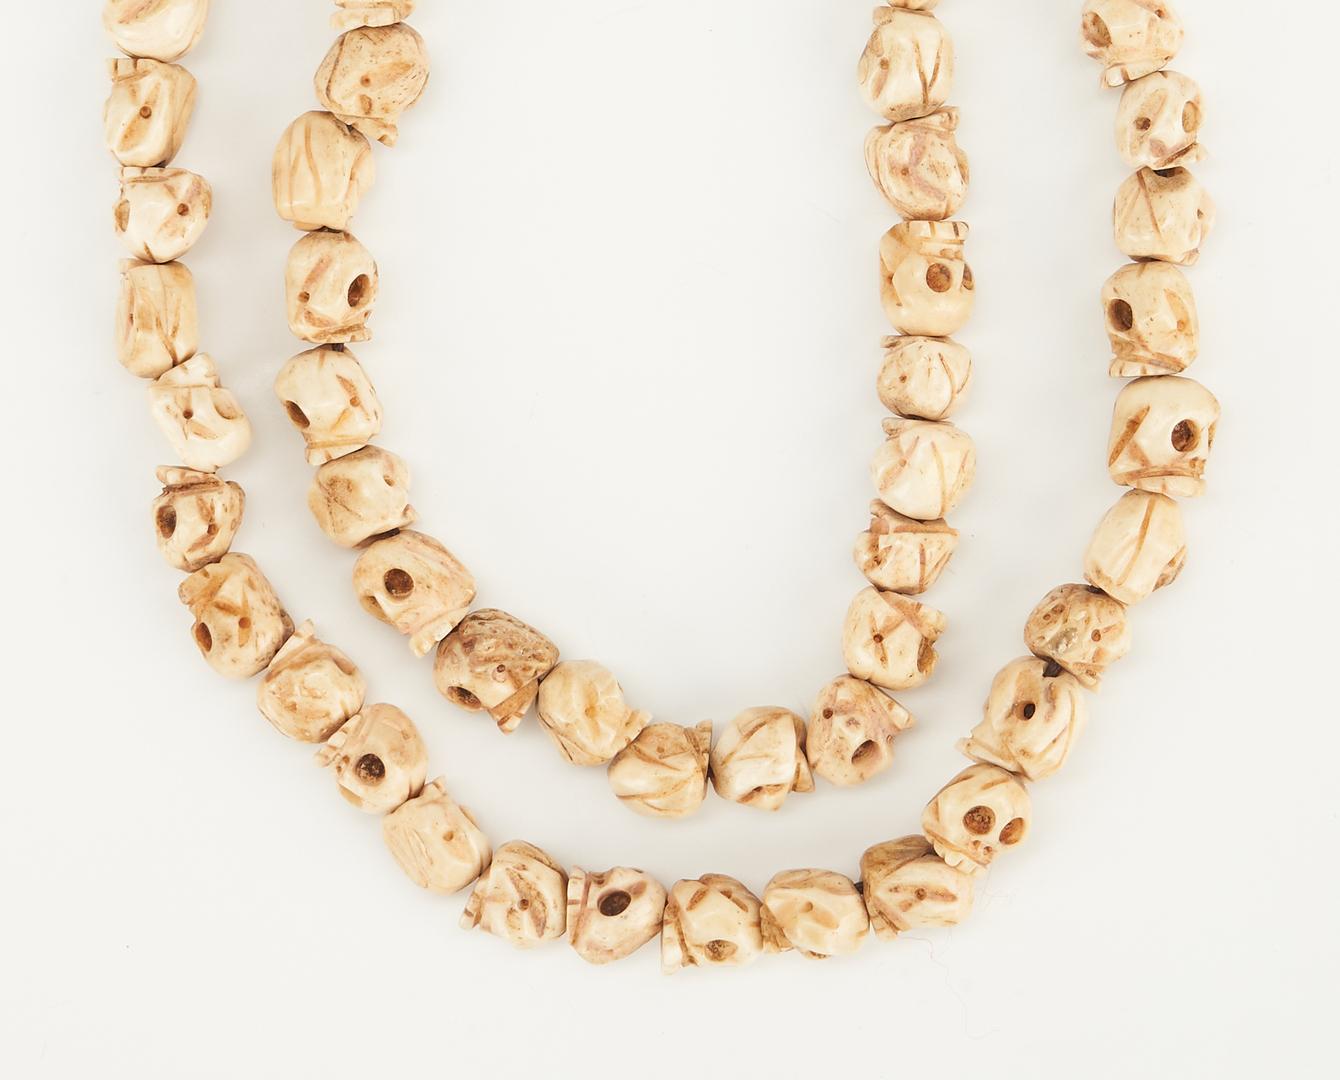 Lot 1203: Burmese Naga Conch Fossil Necklace & Asian Prayer Bead Necklace